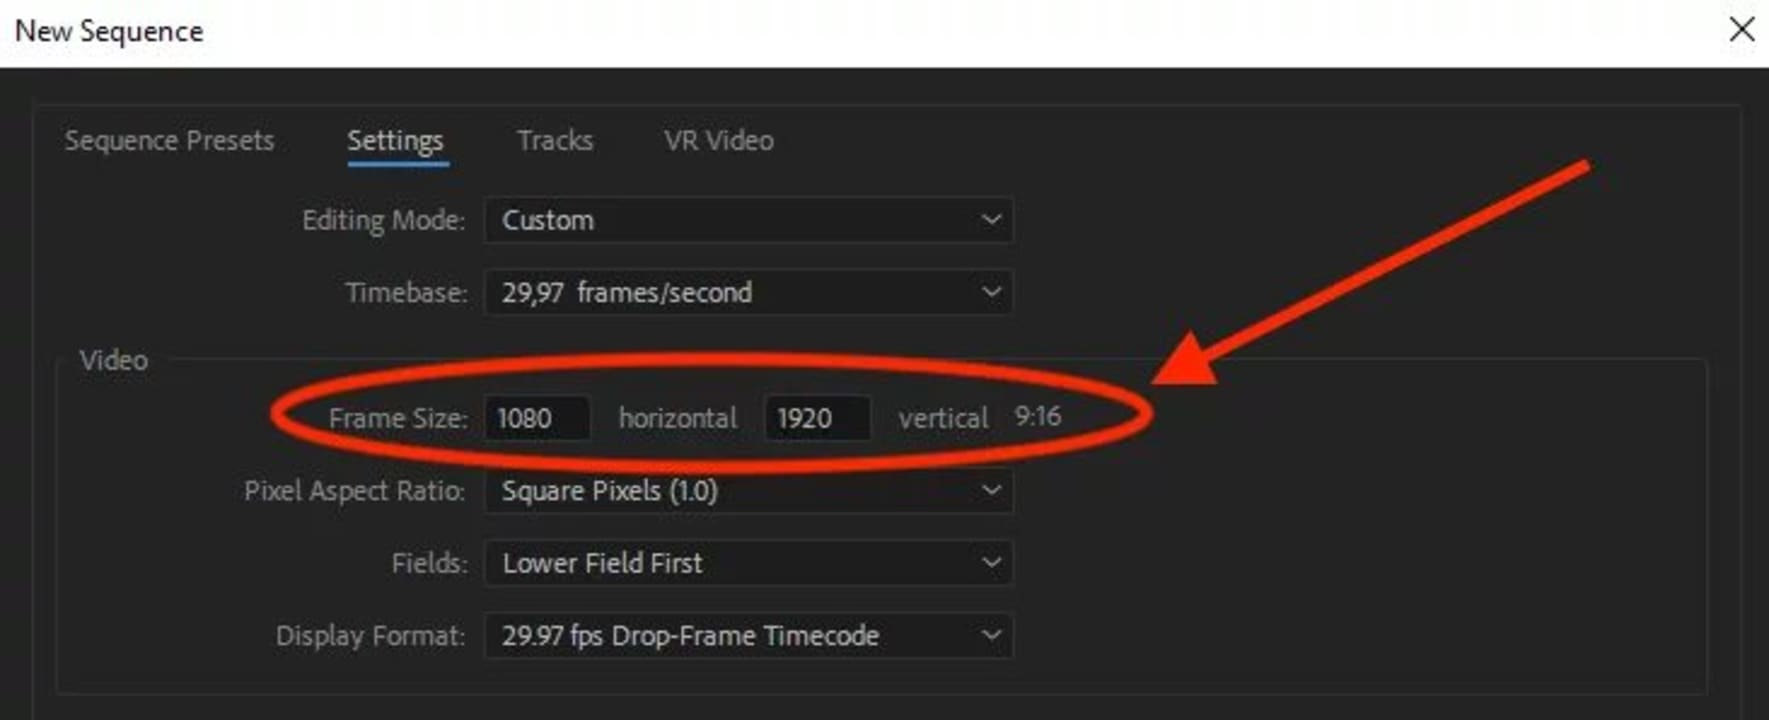 How to Make TikTok Videos in 3 Fast Steps